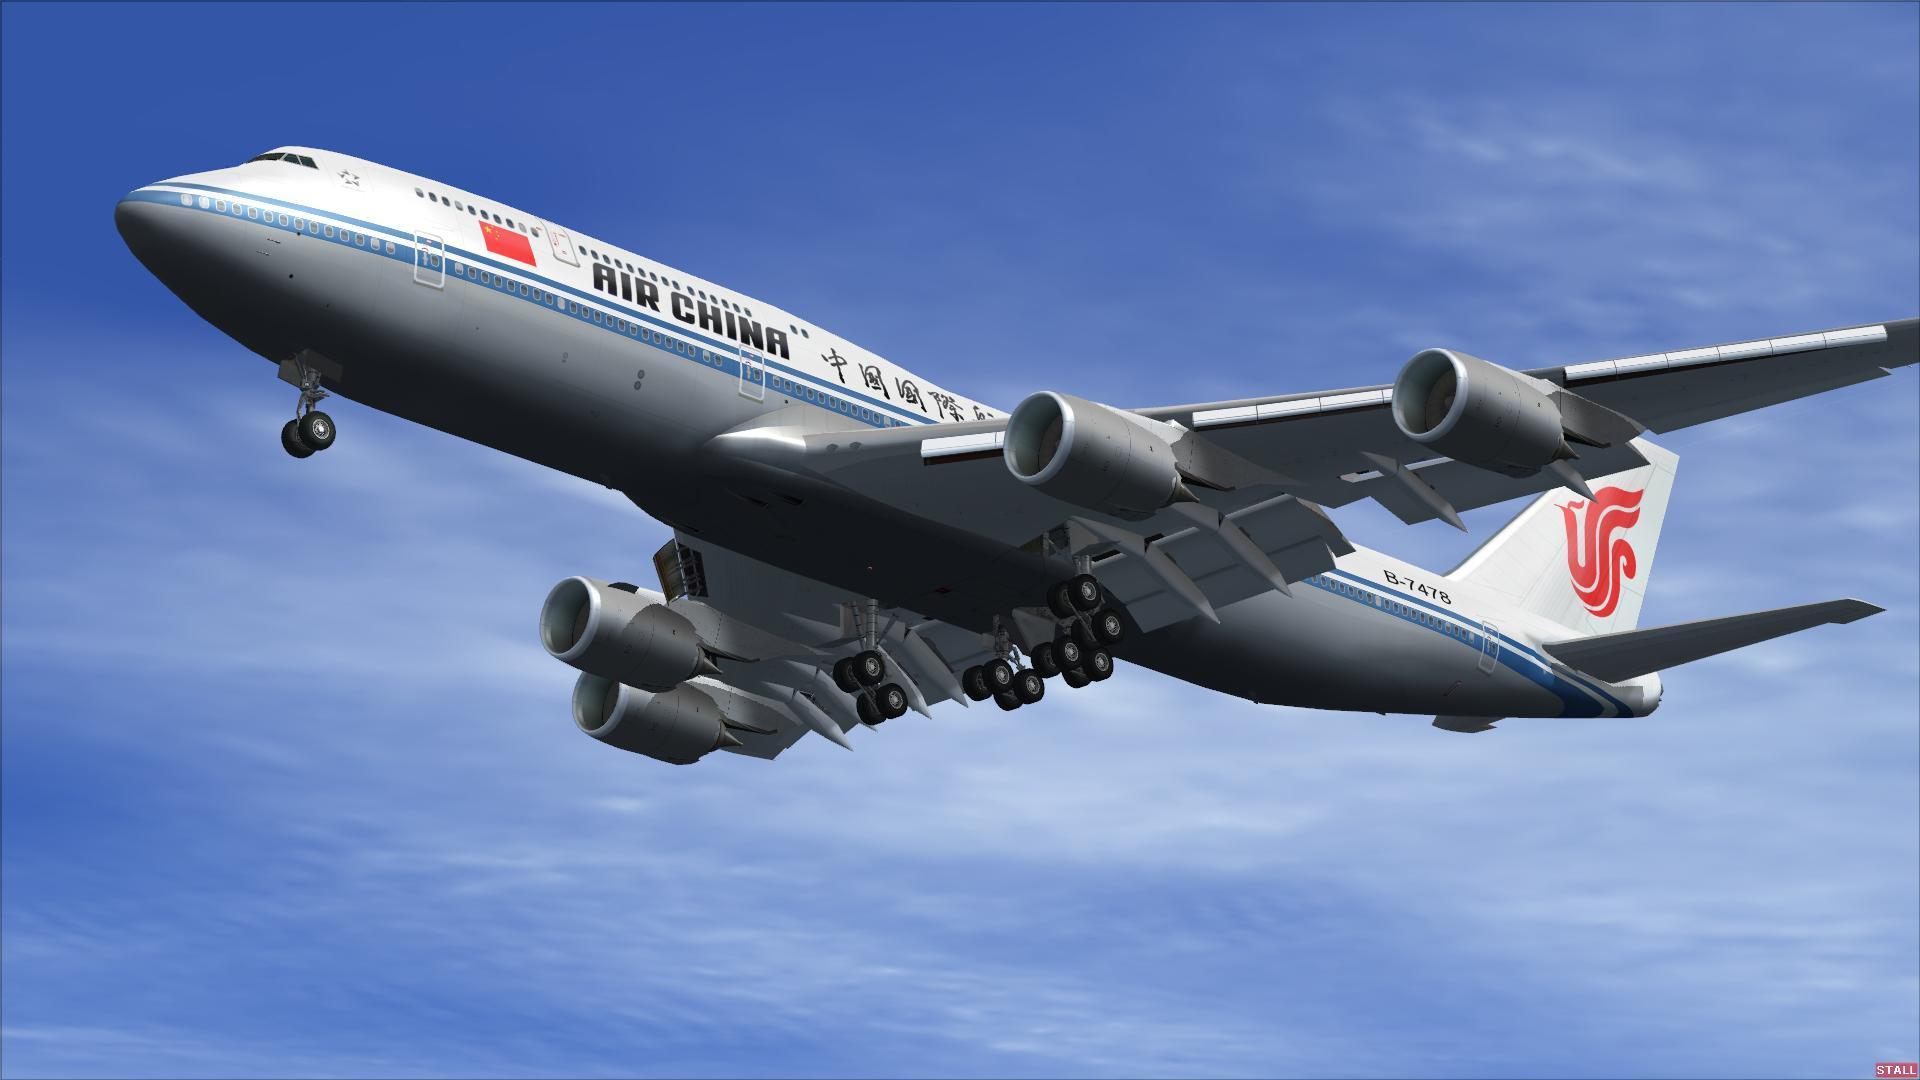 equipaje de mano air china